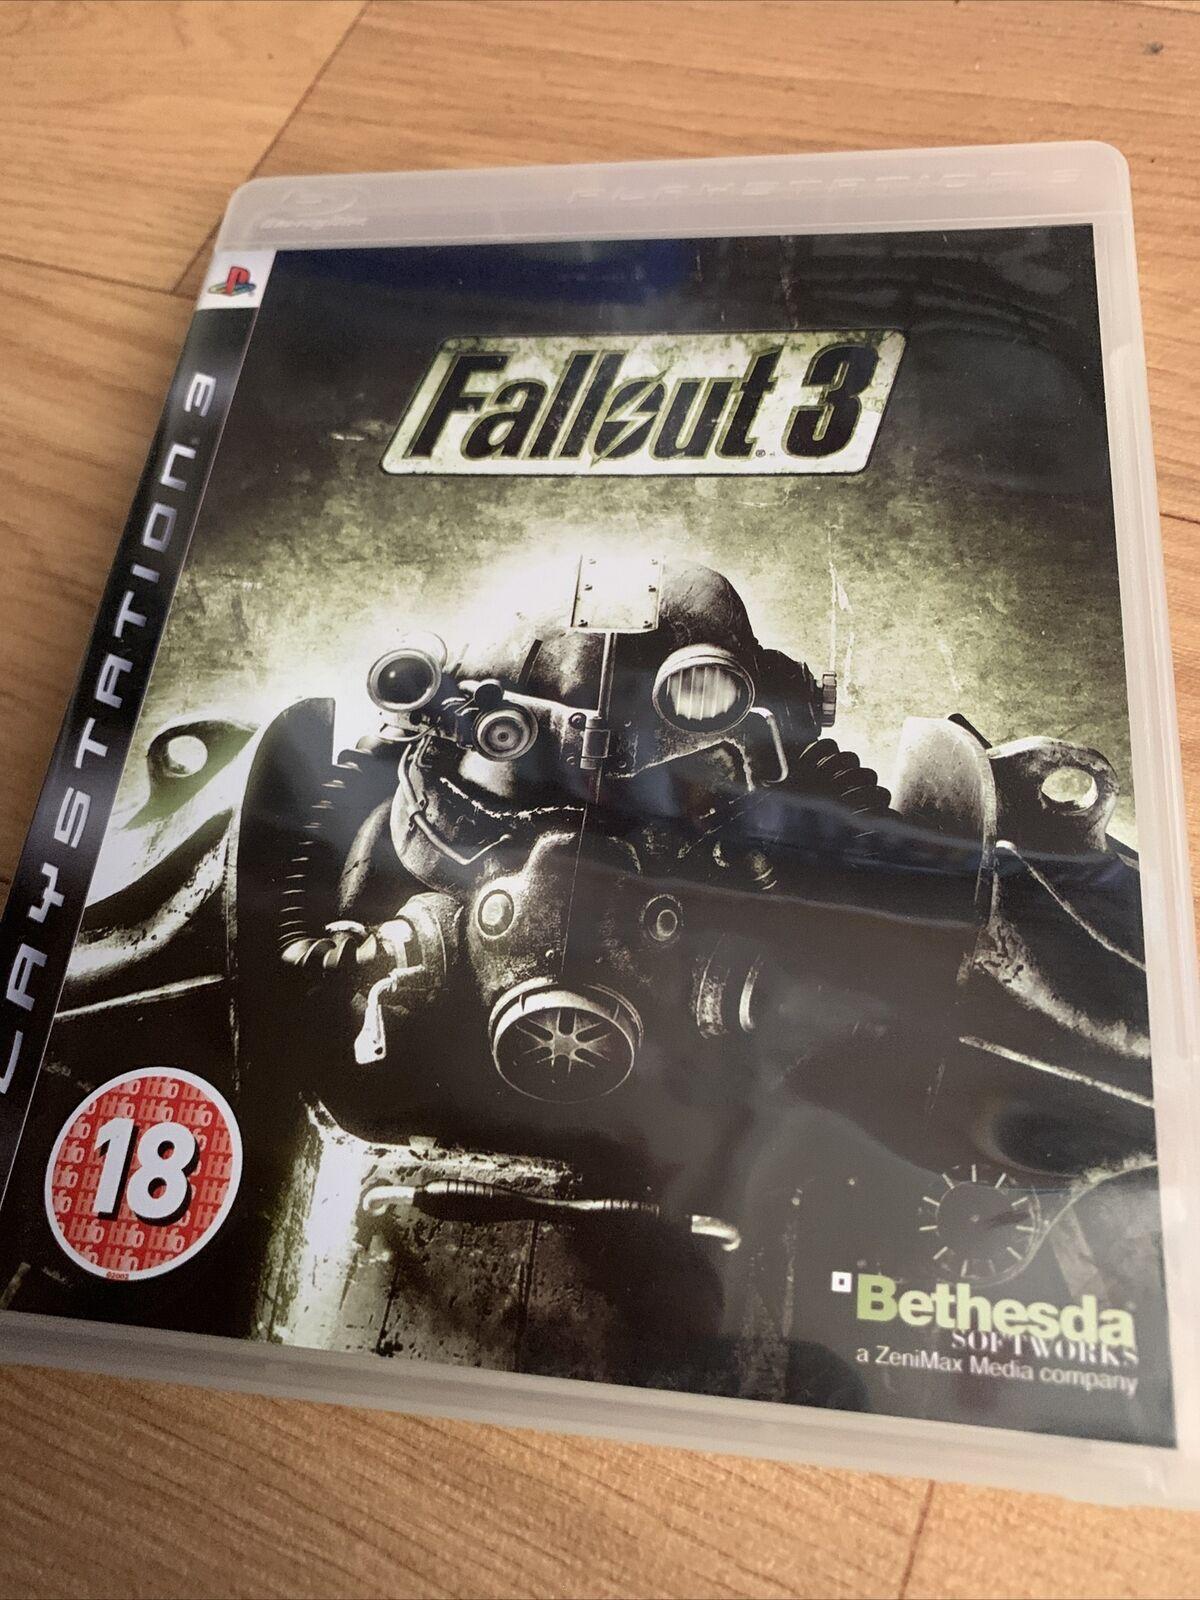 Fallout 3 (Sony PlayStation 3, 2008)